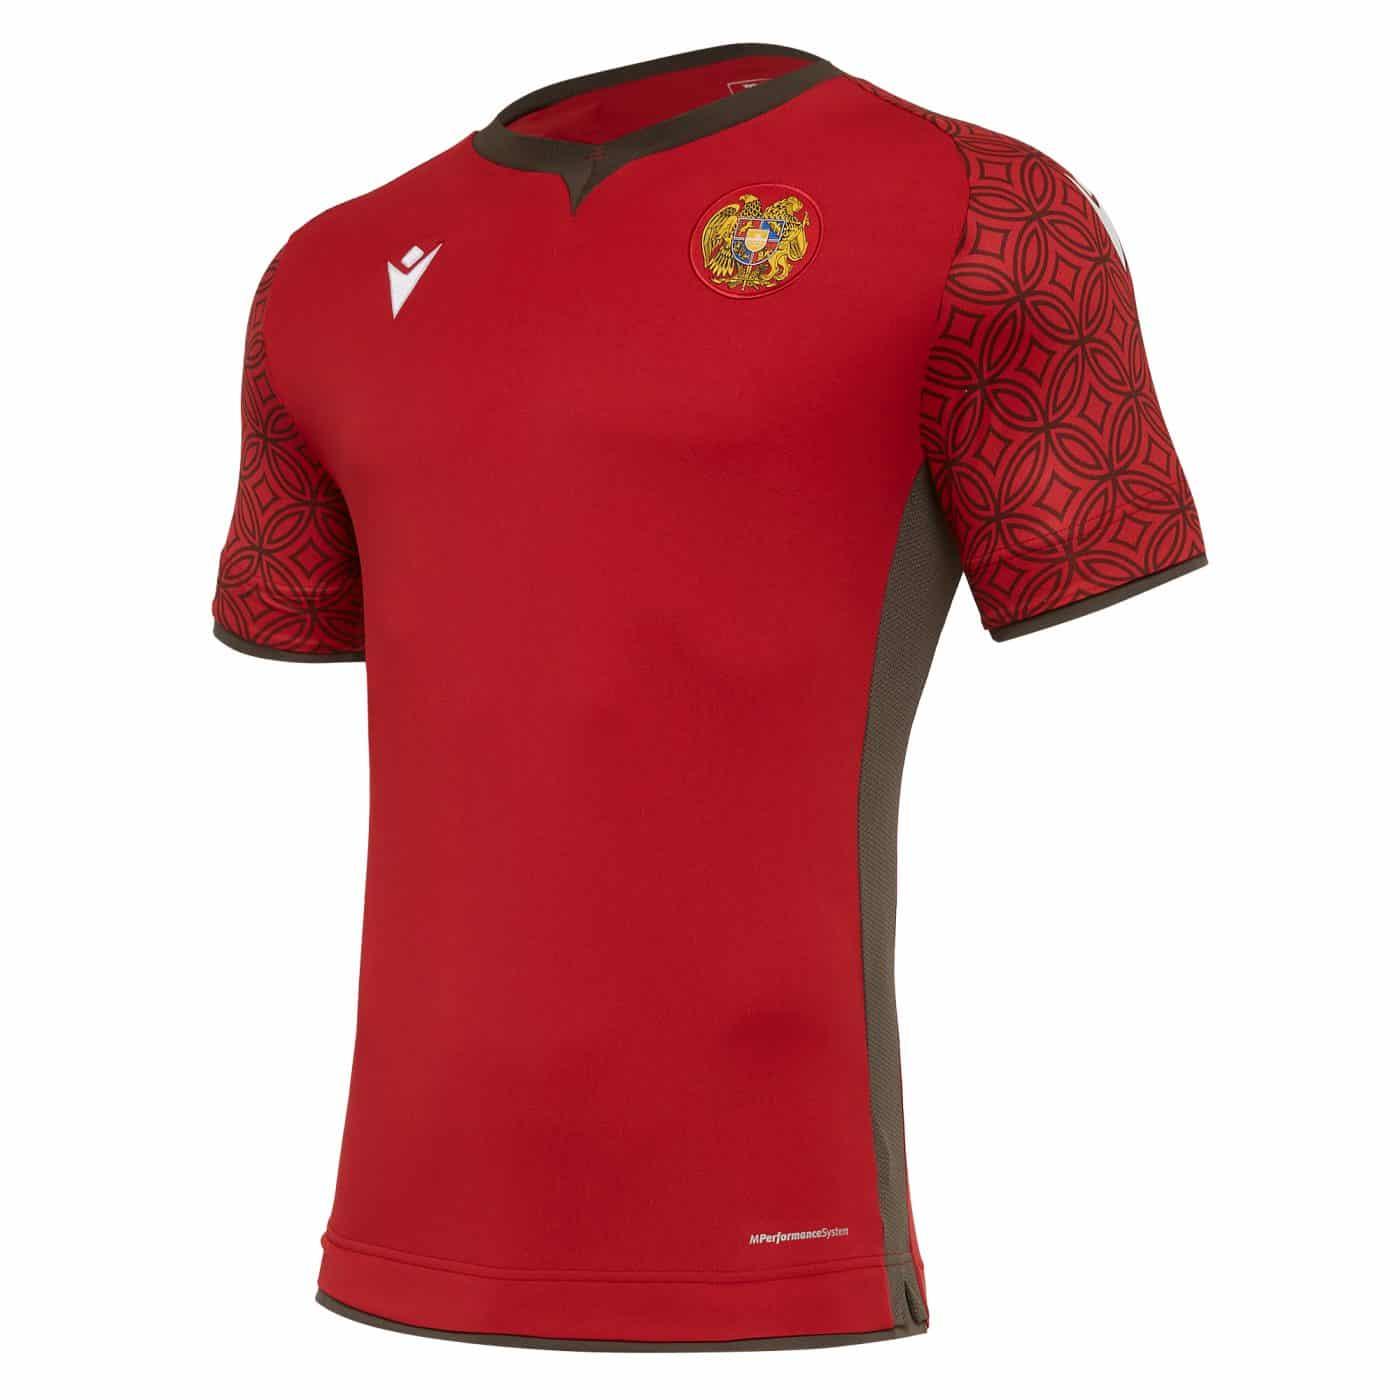 maillot-domicile-armenie-2020-2021-macron-uefa-armenia-jersey-2020